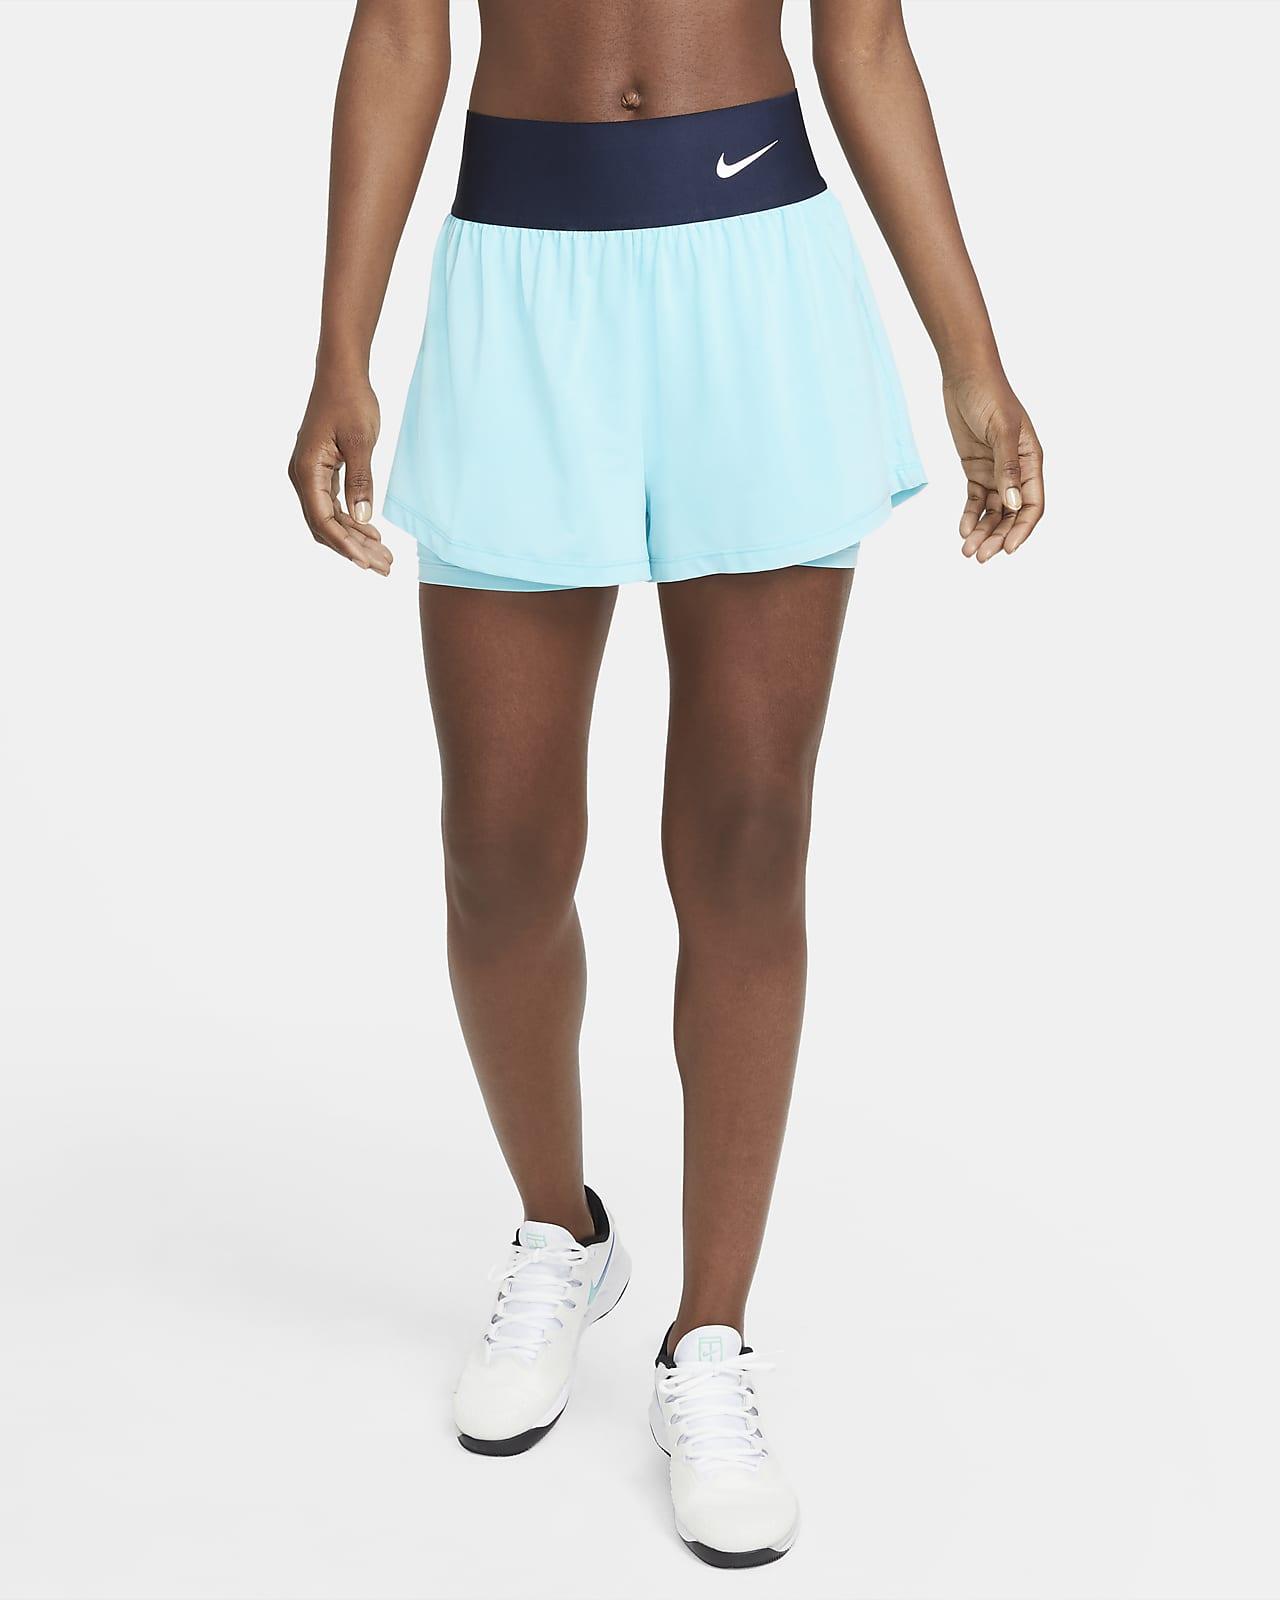 NikeCourt Advantage tennisshorts til dame